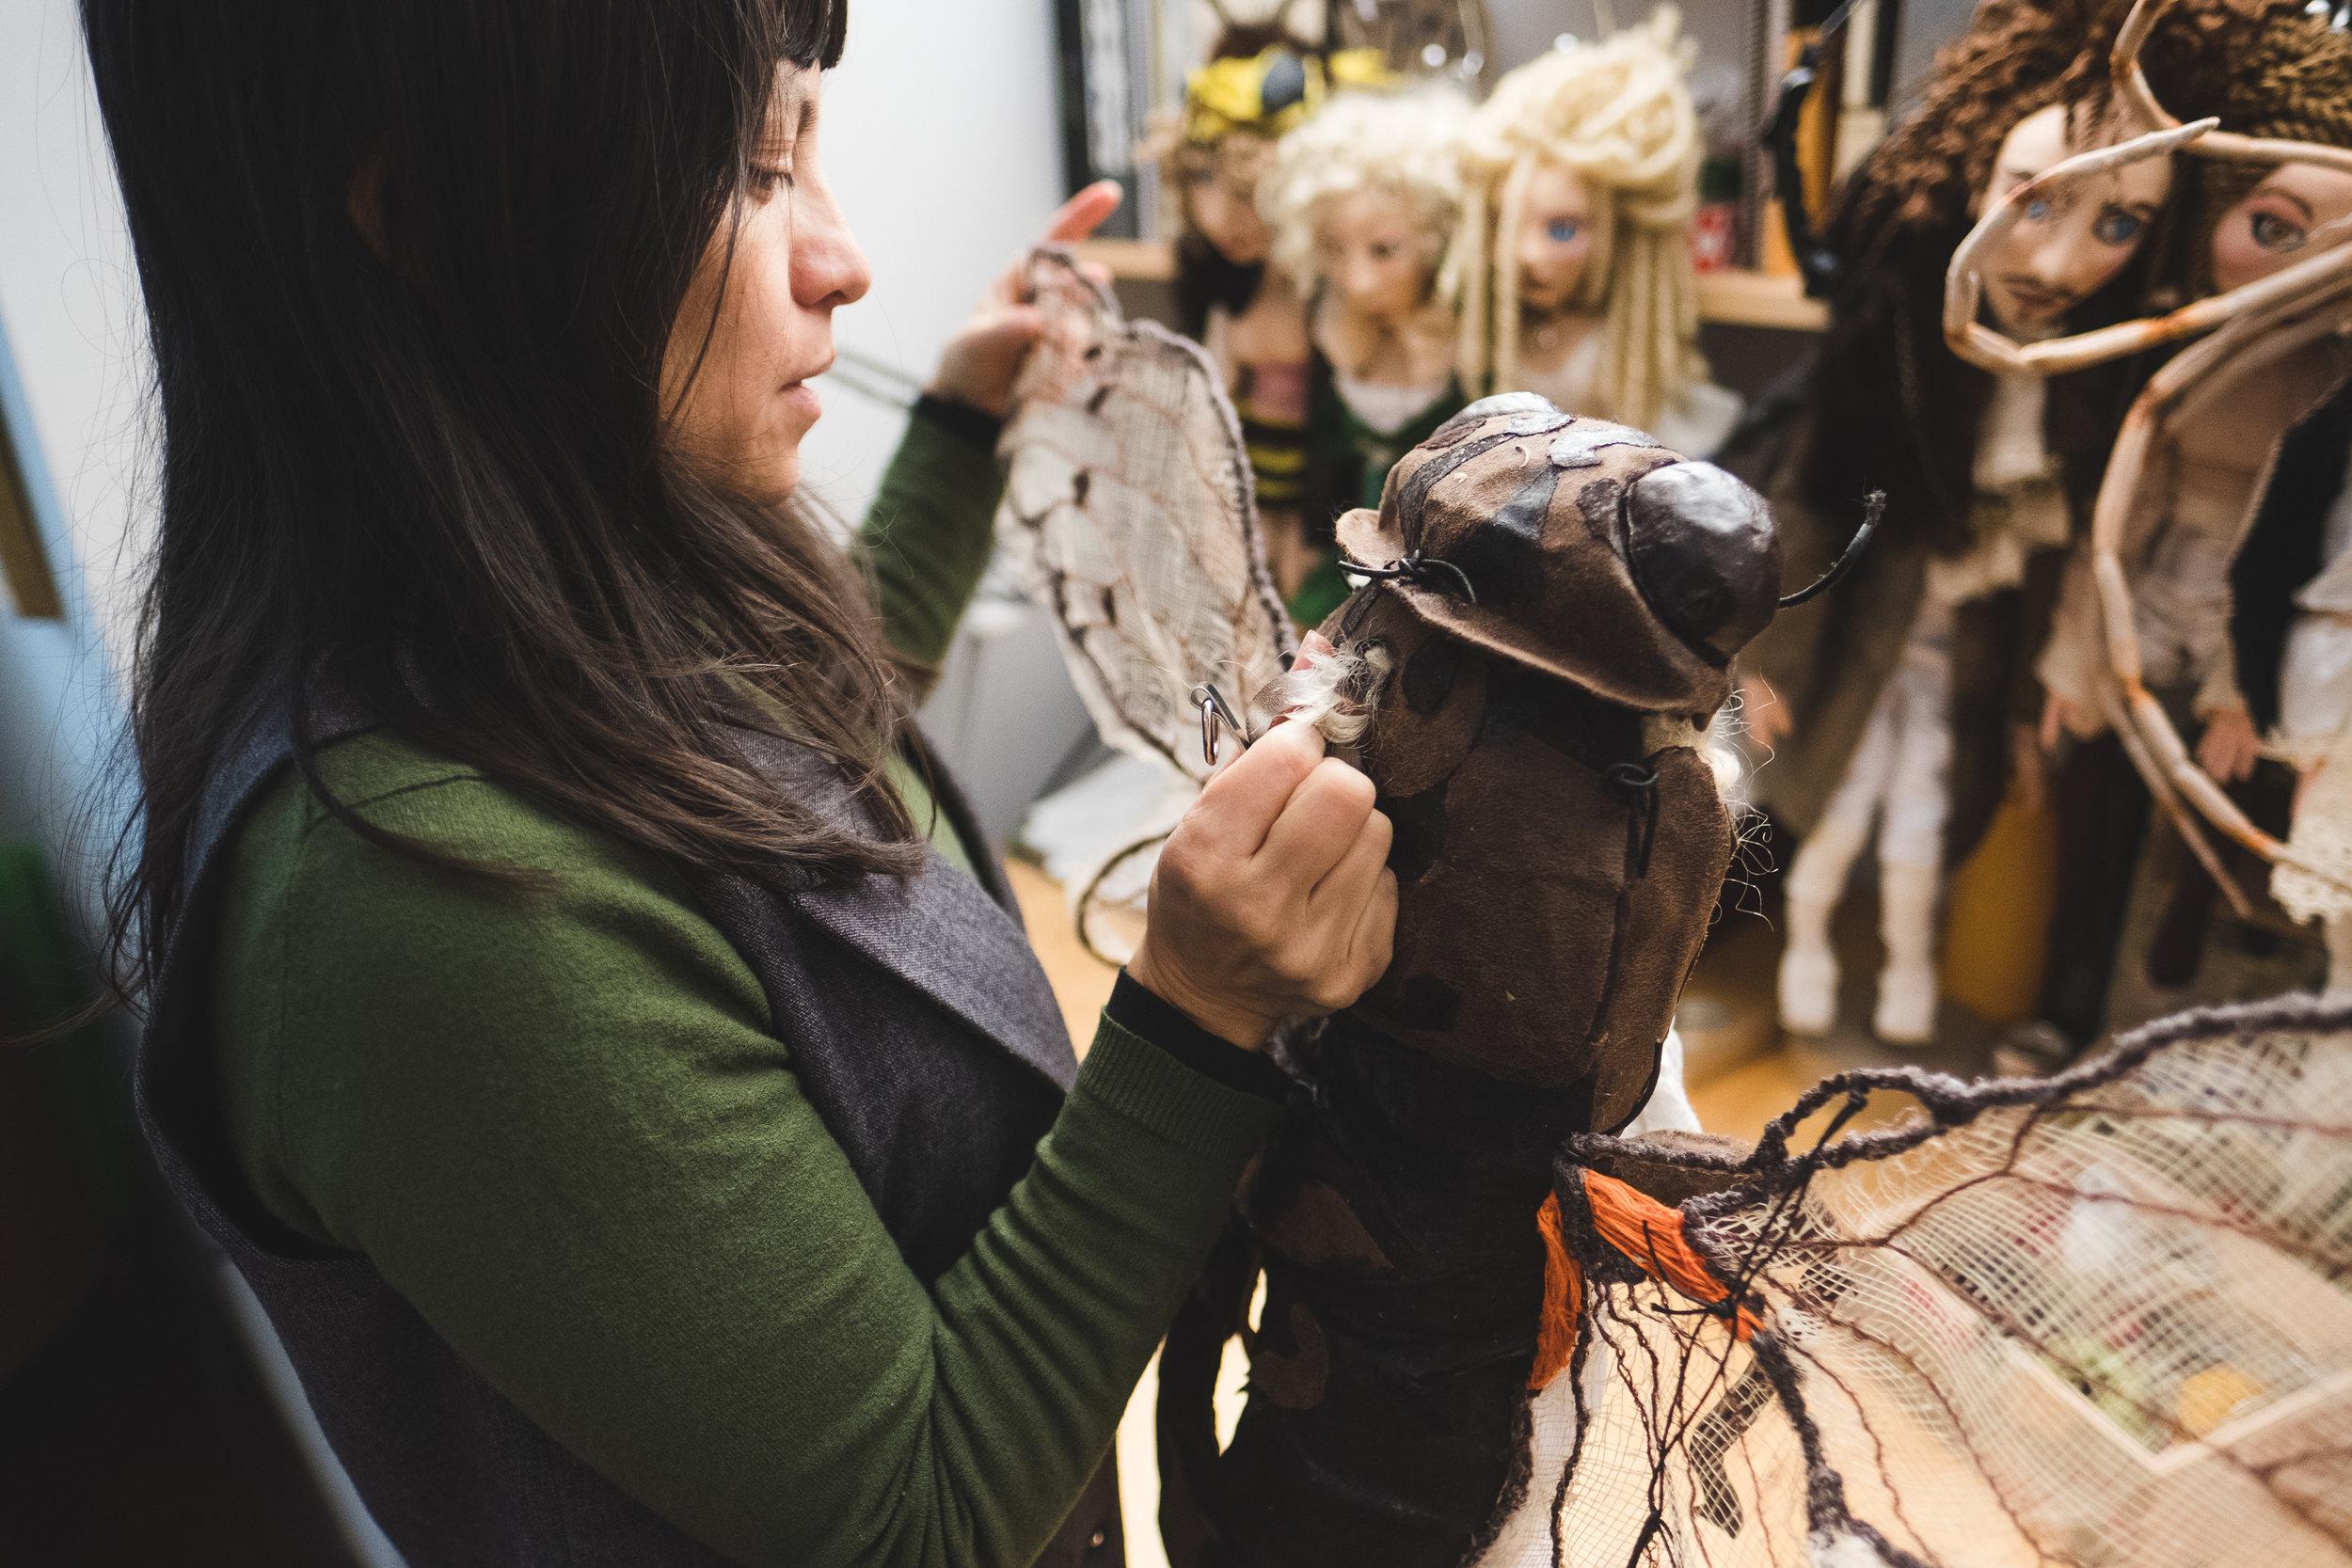 cicada-puppet-by-montreal-artist-mirna-rivera